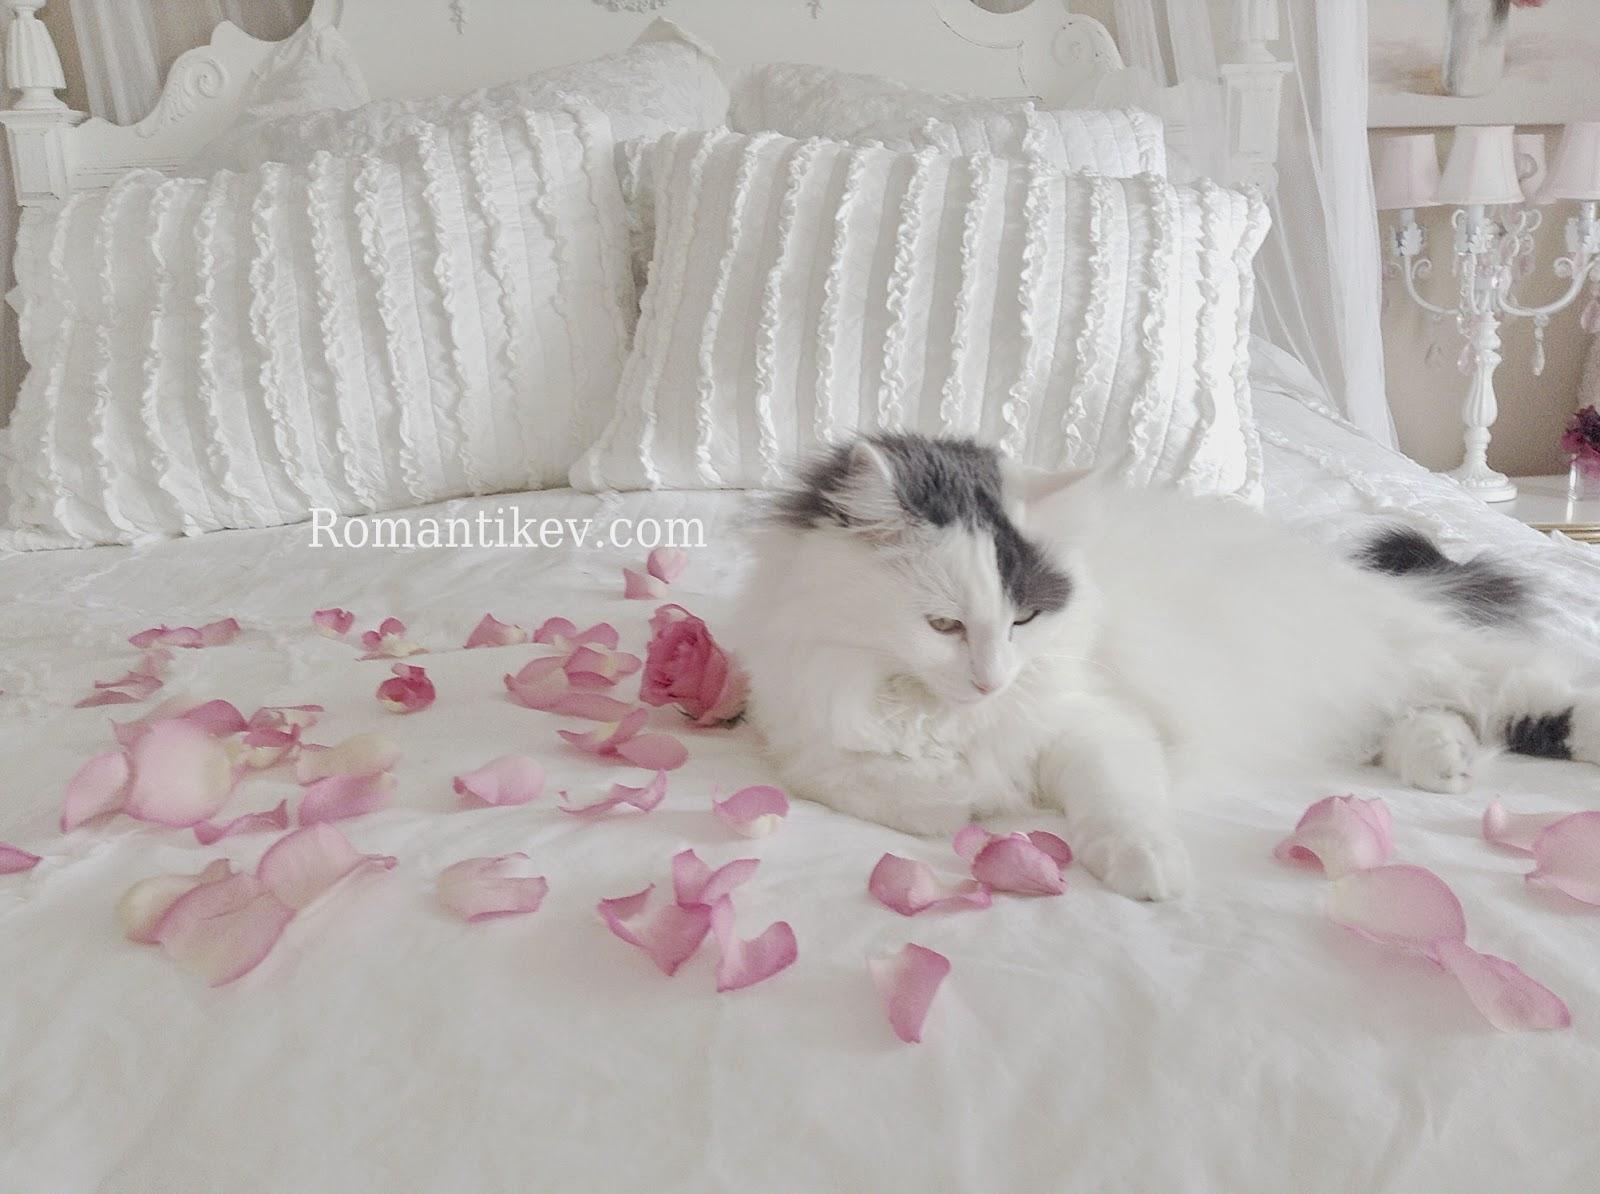 Romantic shabby chic home romantic shabby chic blog - Romantic Shabby Chic White Whisper